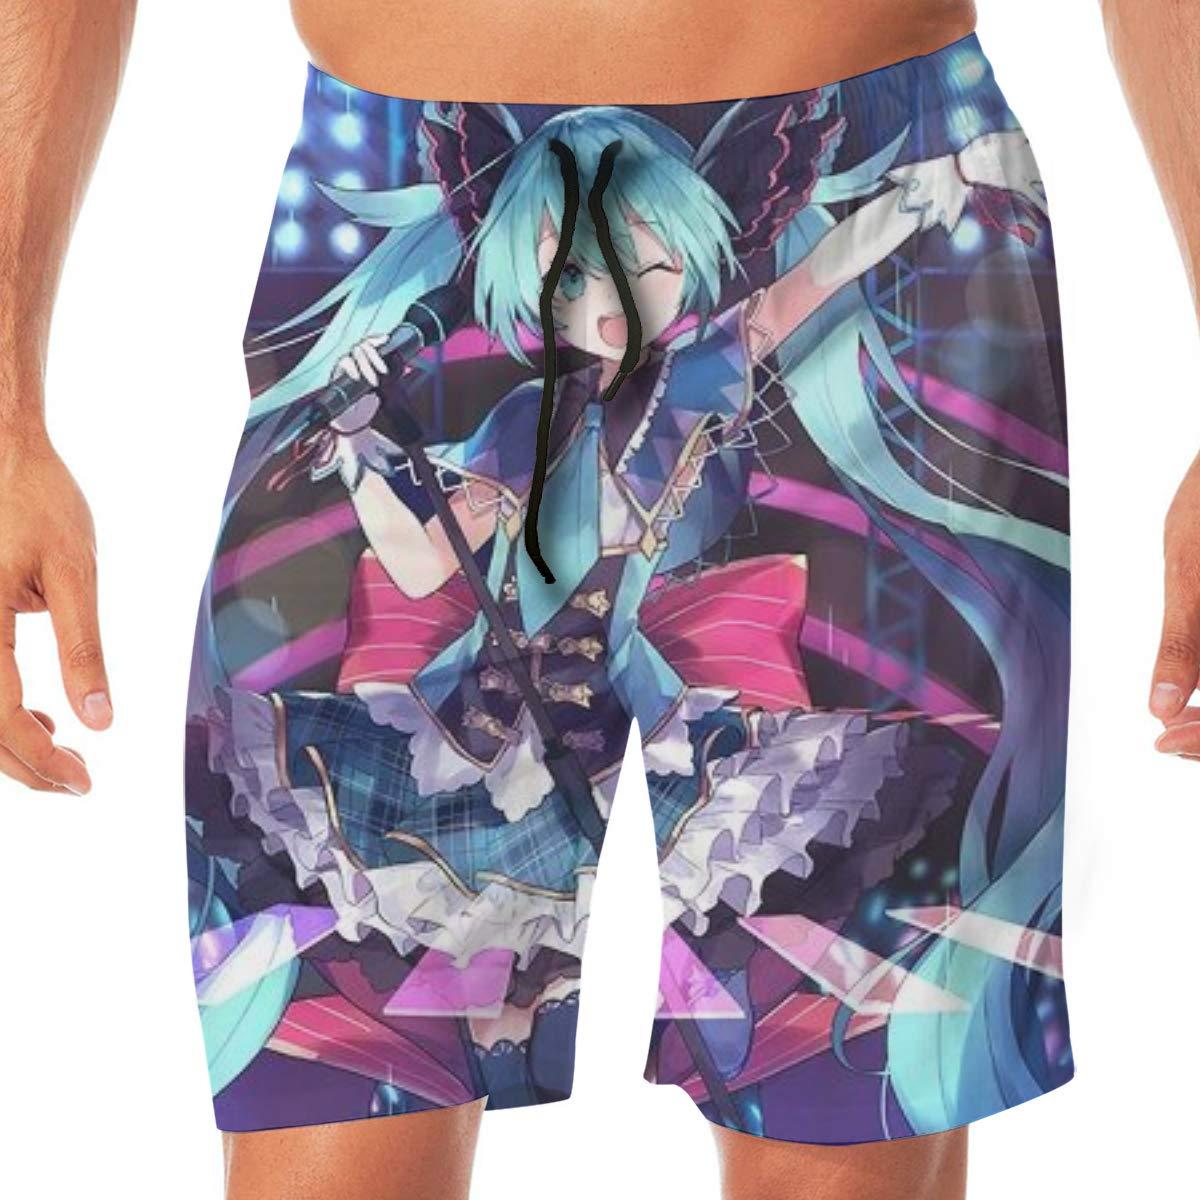 FANGHUABATHRHSQ Sing Hatsune-Miku 3D Printed Men Board Beach Shorts Hawaii Swimwear Pants Boardshort Swim Trunk Bathing Suits